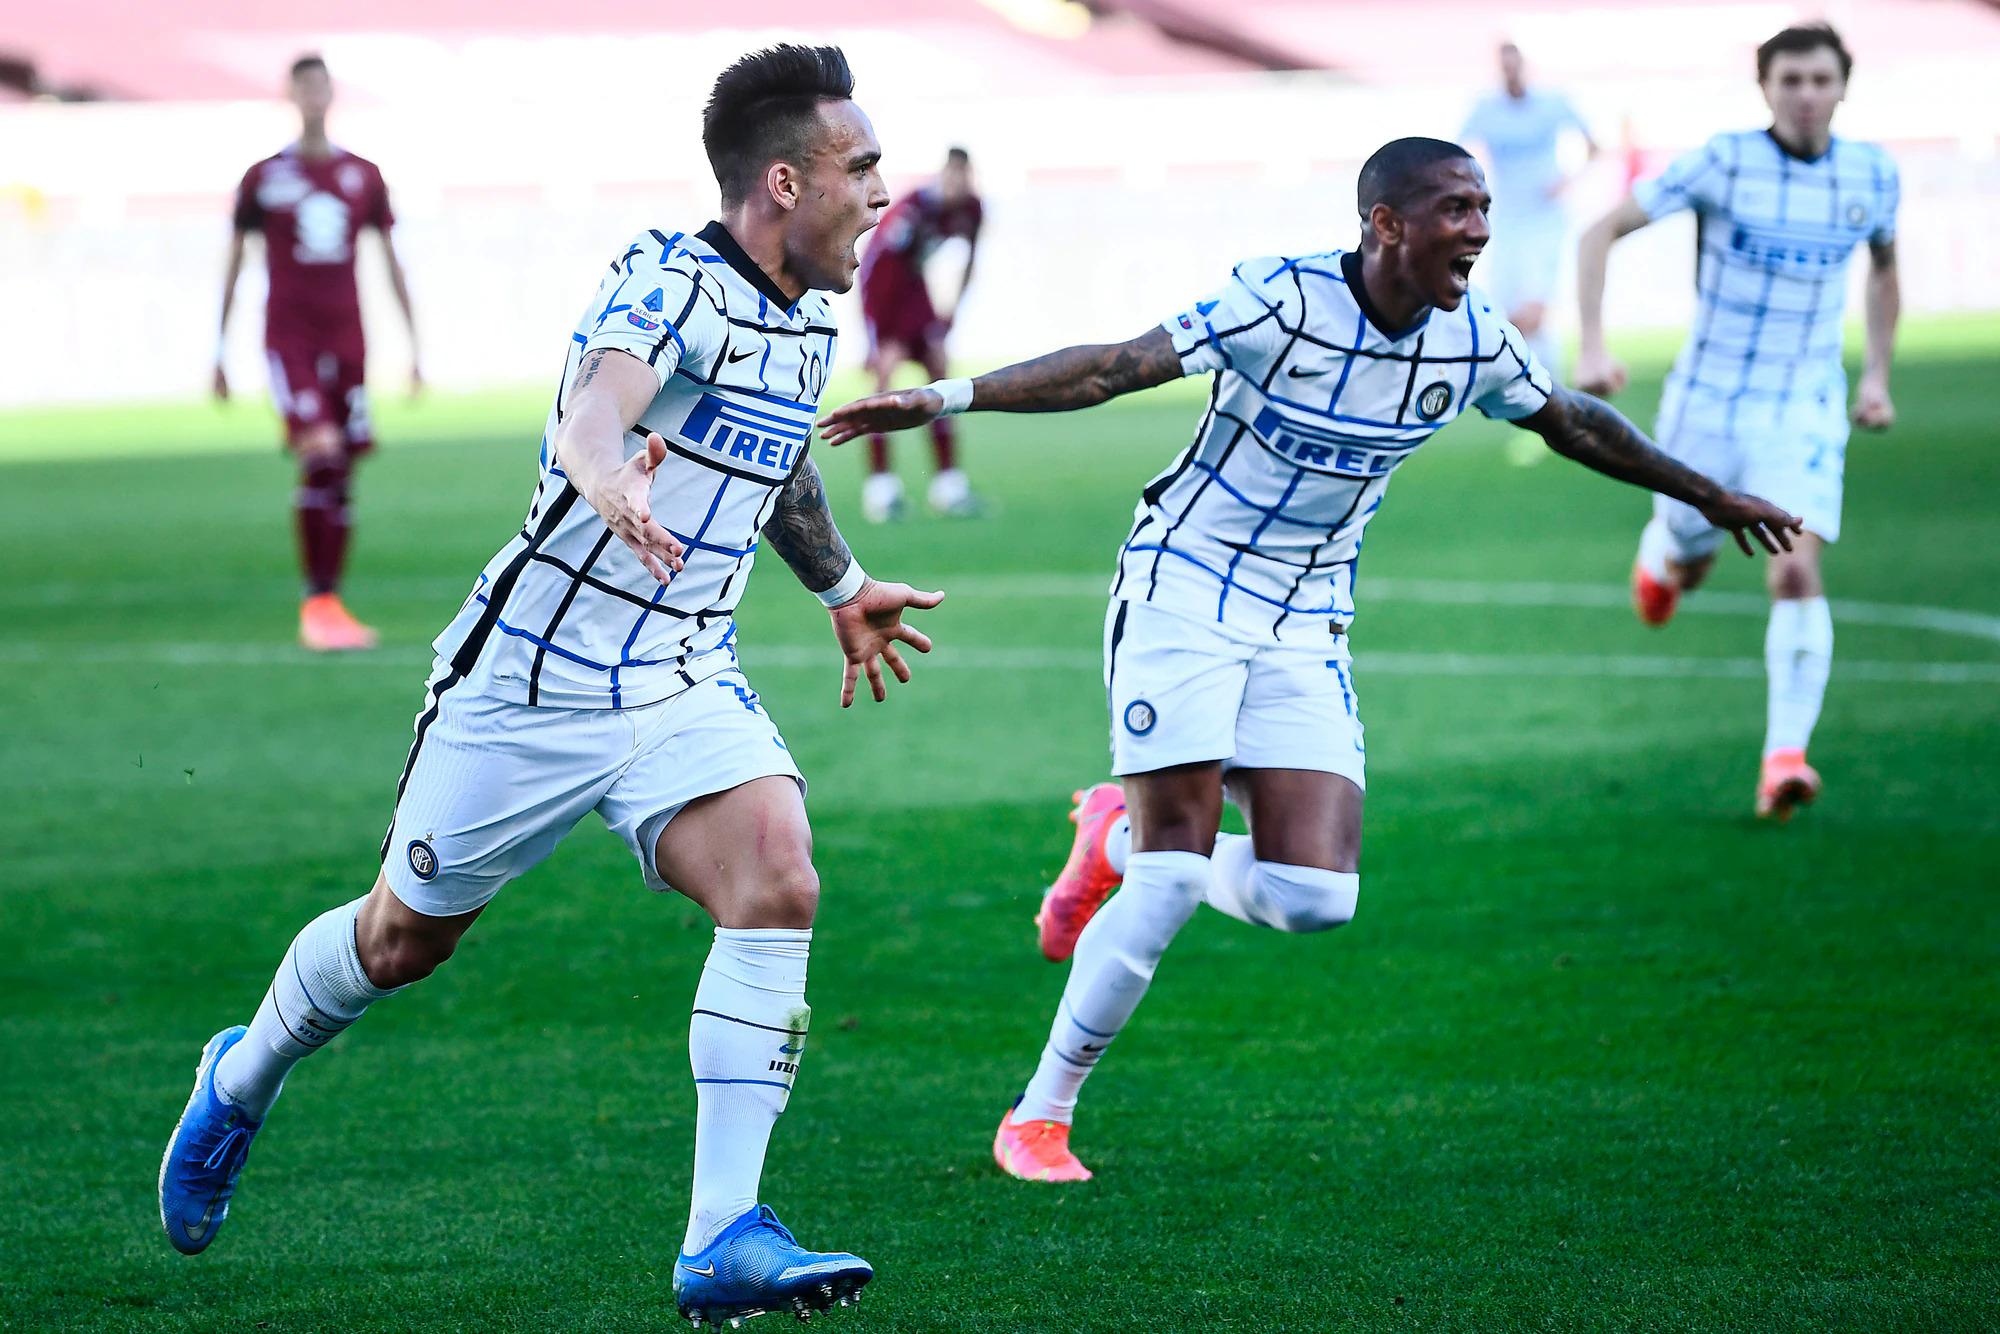 Lautaro (kiri) merayakan kemenangan 2-1 untuk Inter.  Foto: www.imagephotoagency.it